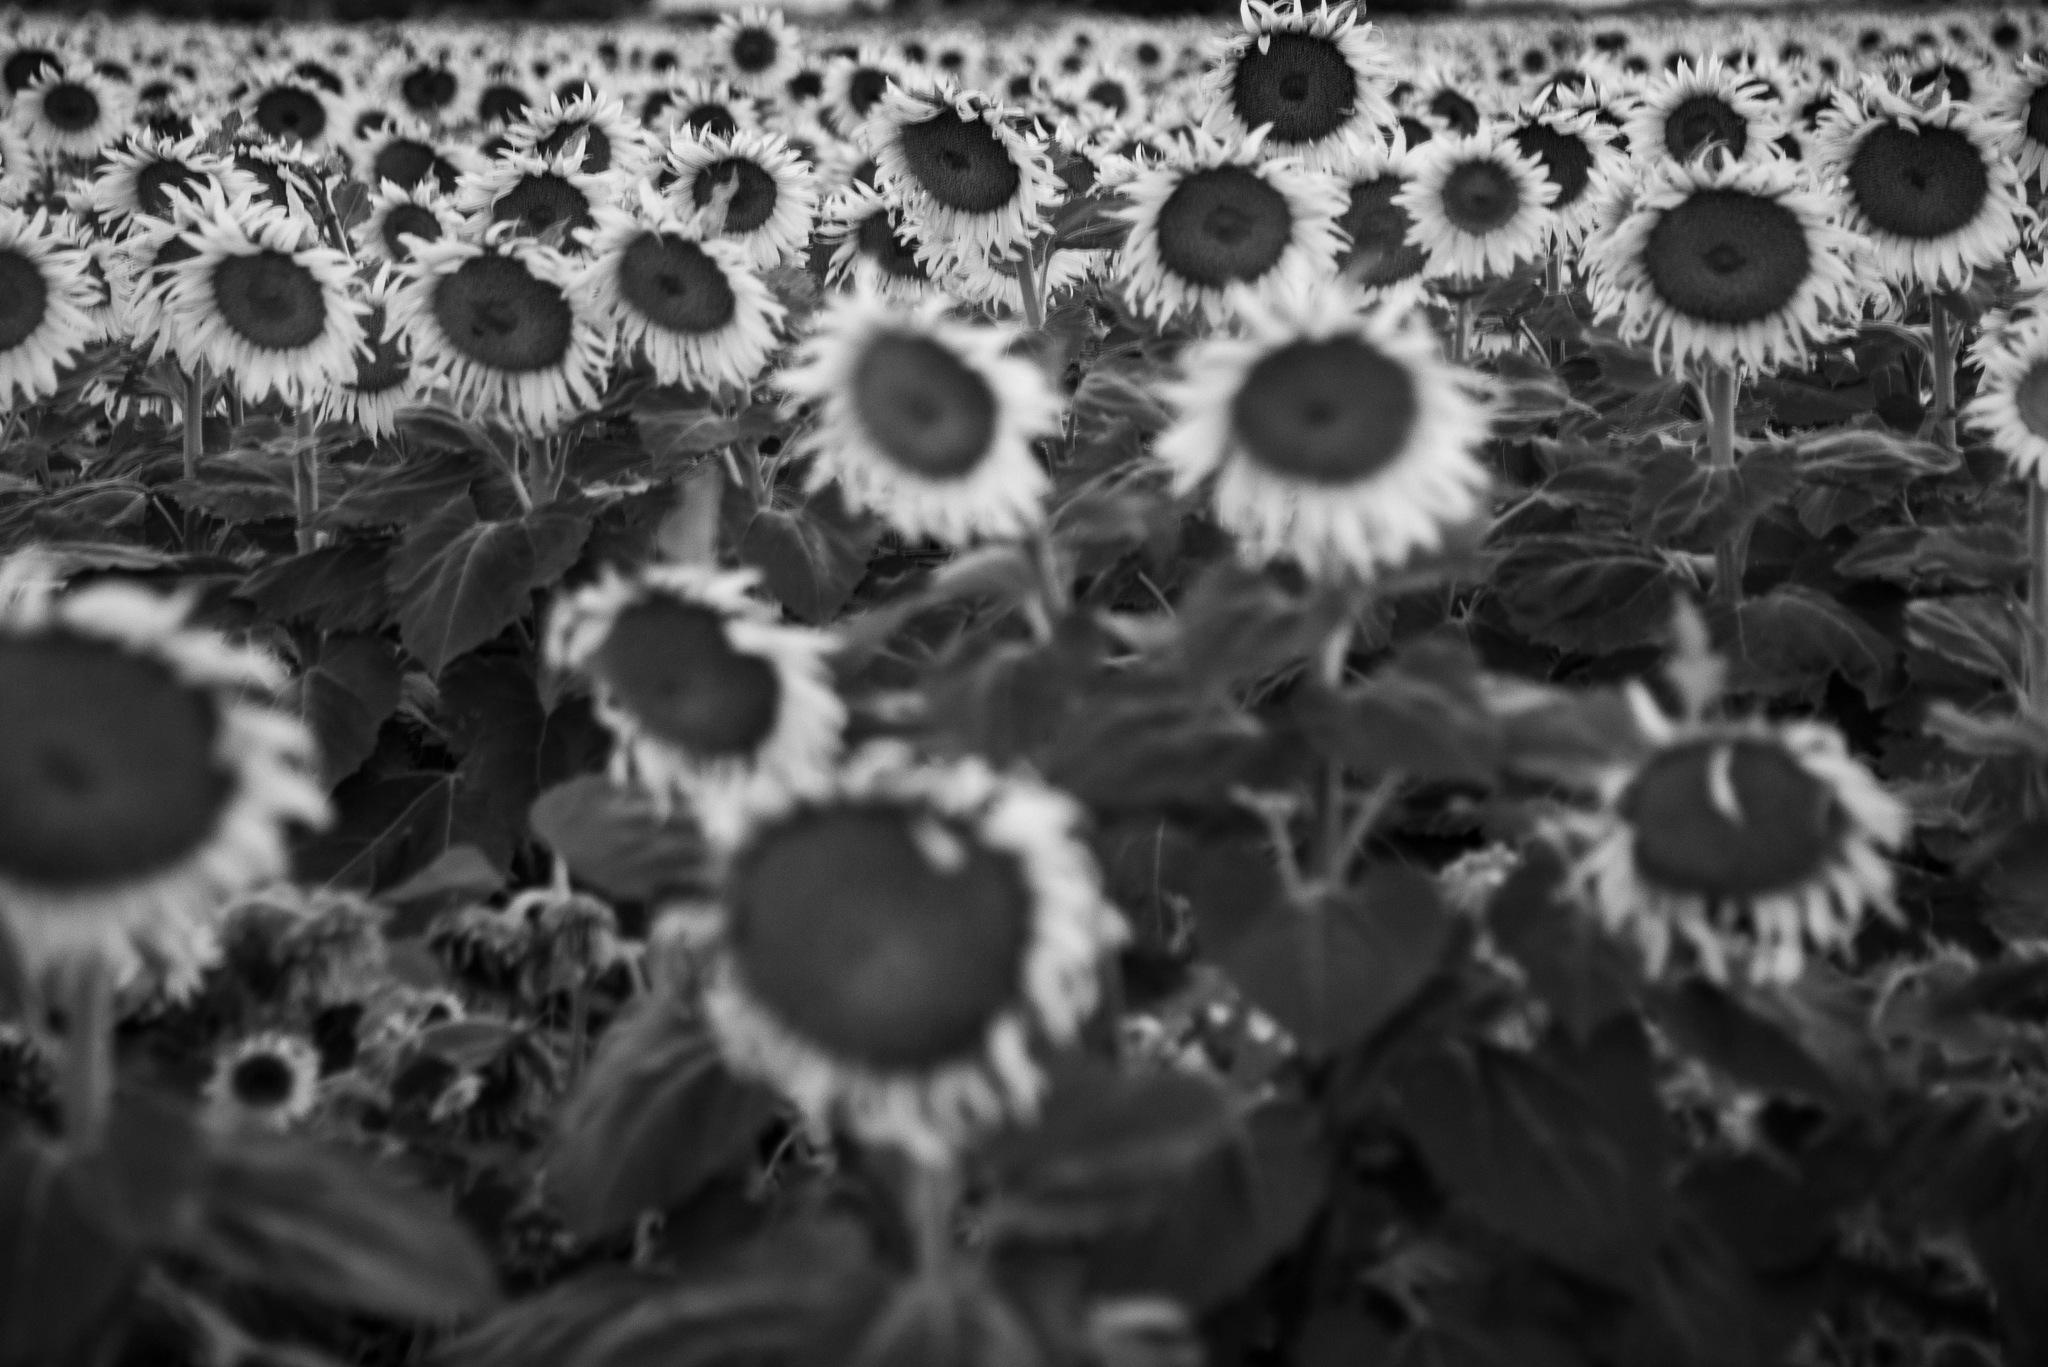 Sunflowers by Craig Turner